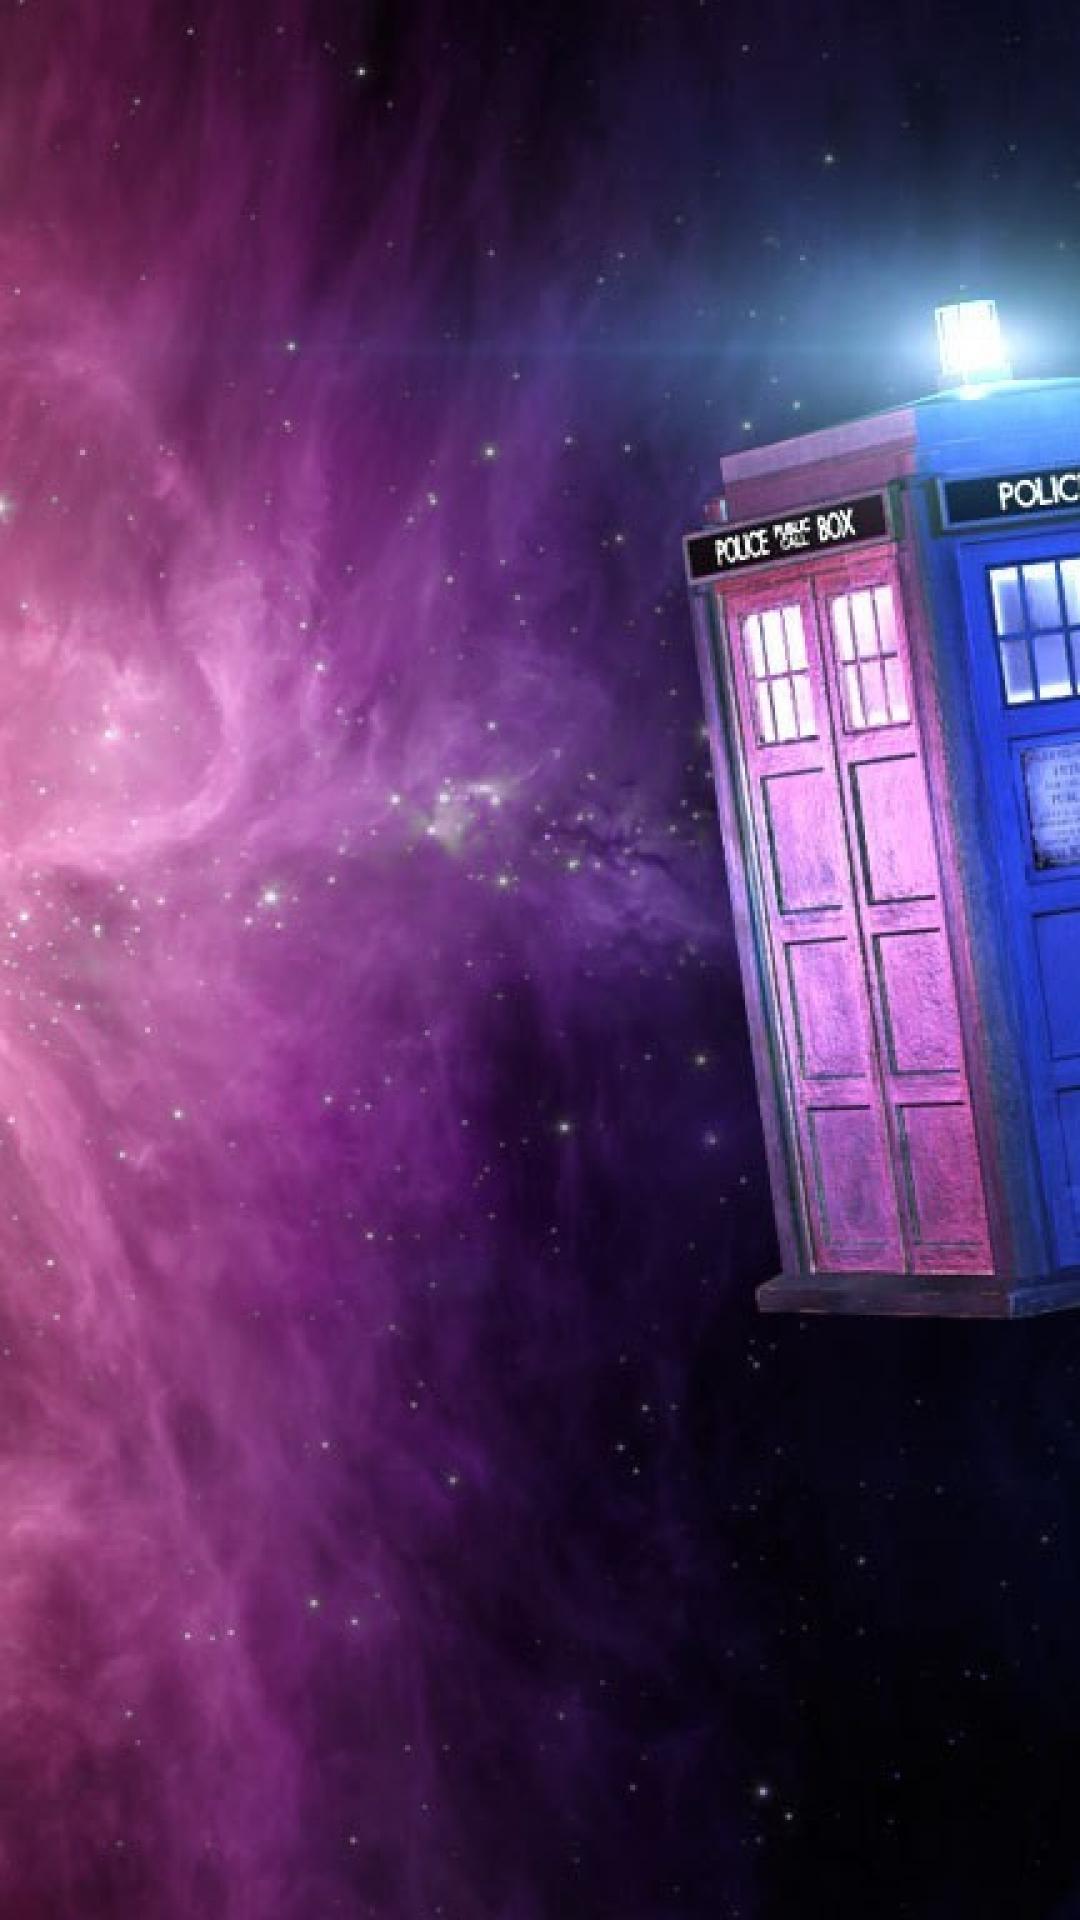 1080x1920px doctor who windows 10 wallpaper wallpapersafari - Tardis wallpaper ...